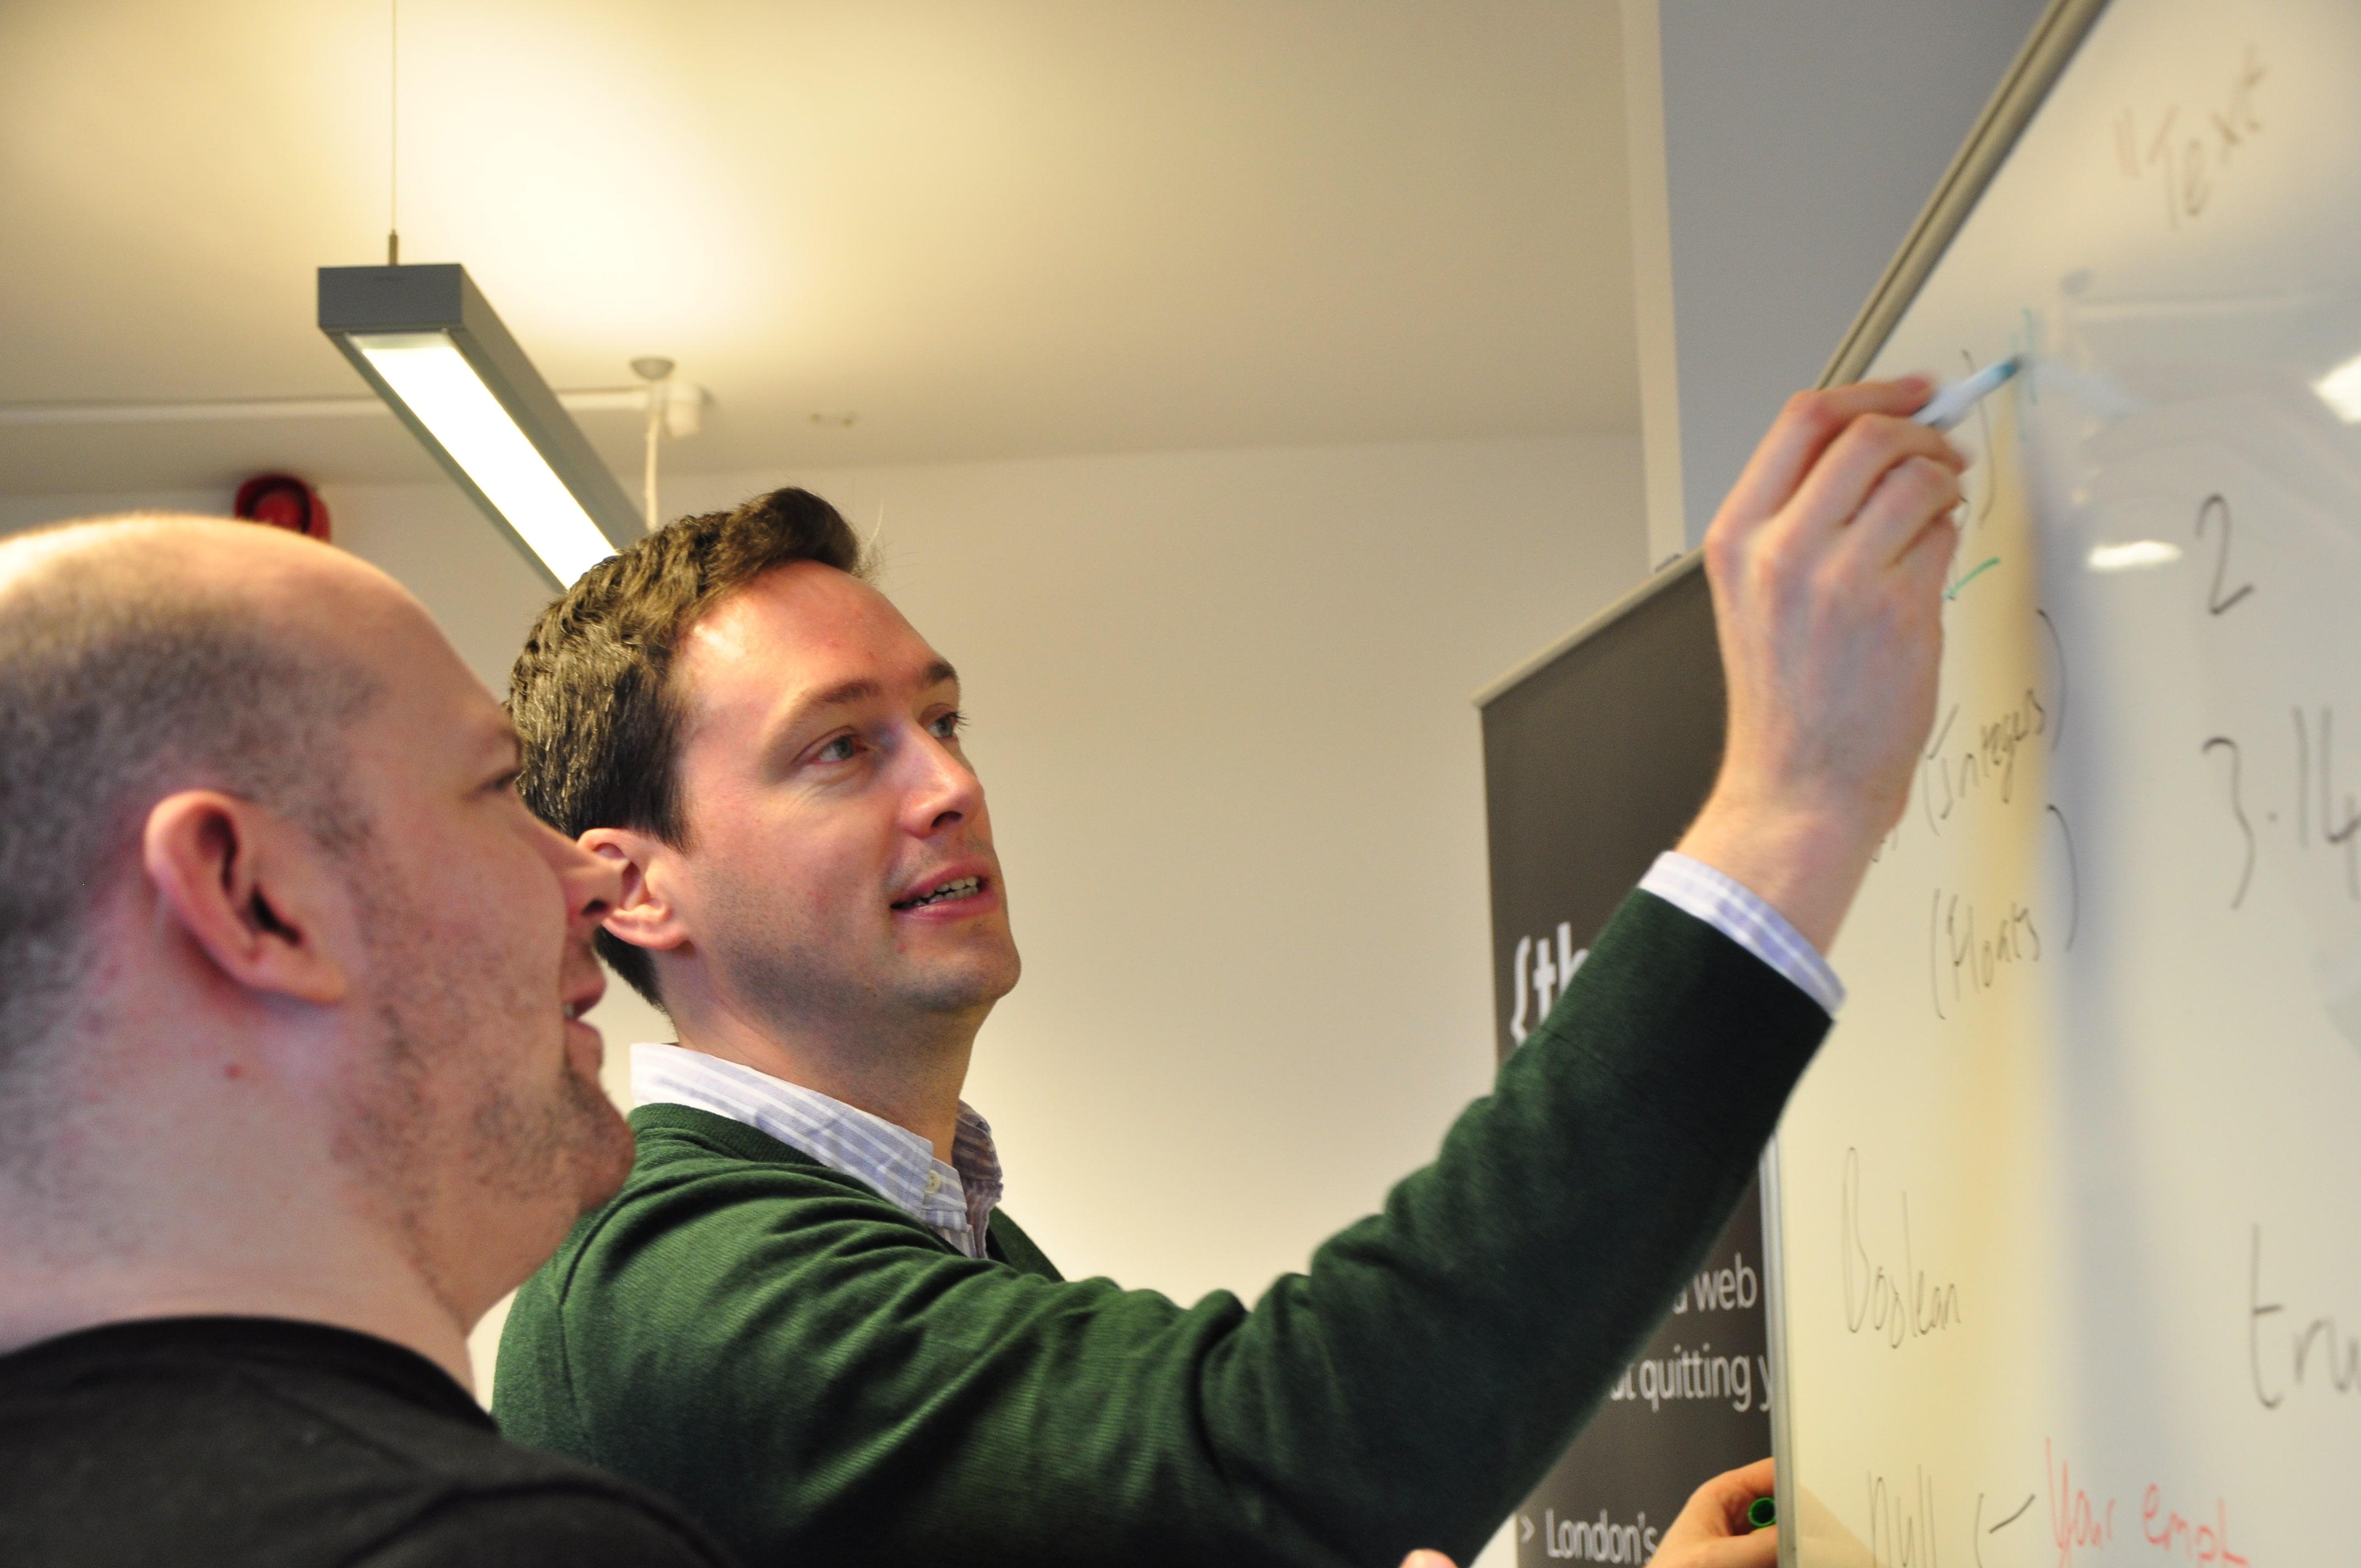 Part-time coding course London | Learn Front-End Web Development